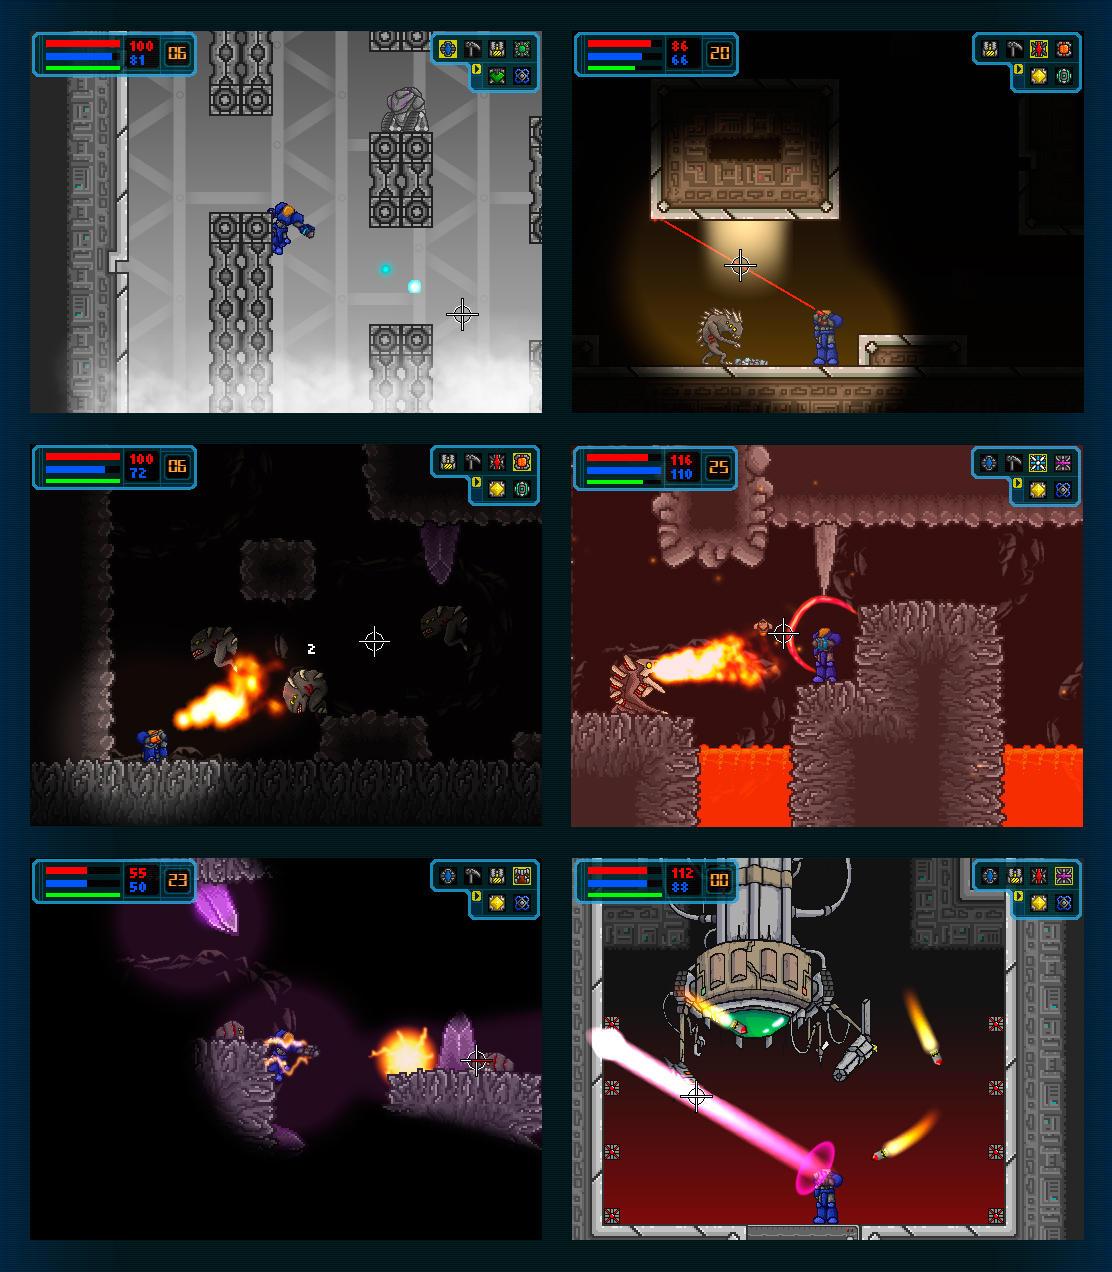 Galactic Marine - Areas 4-6 by BeholderKin